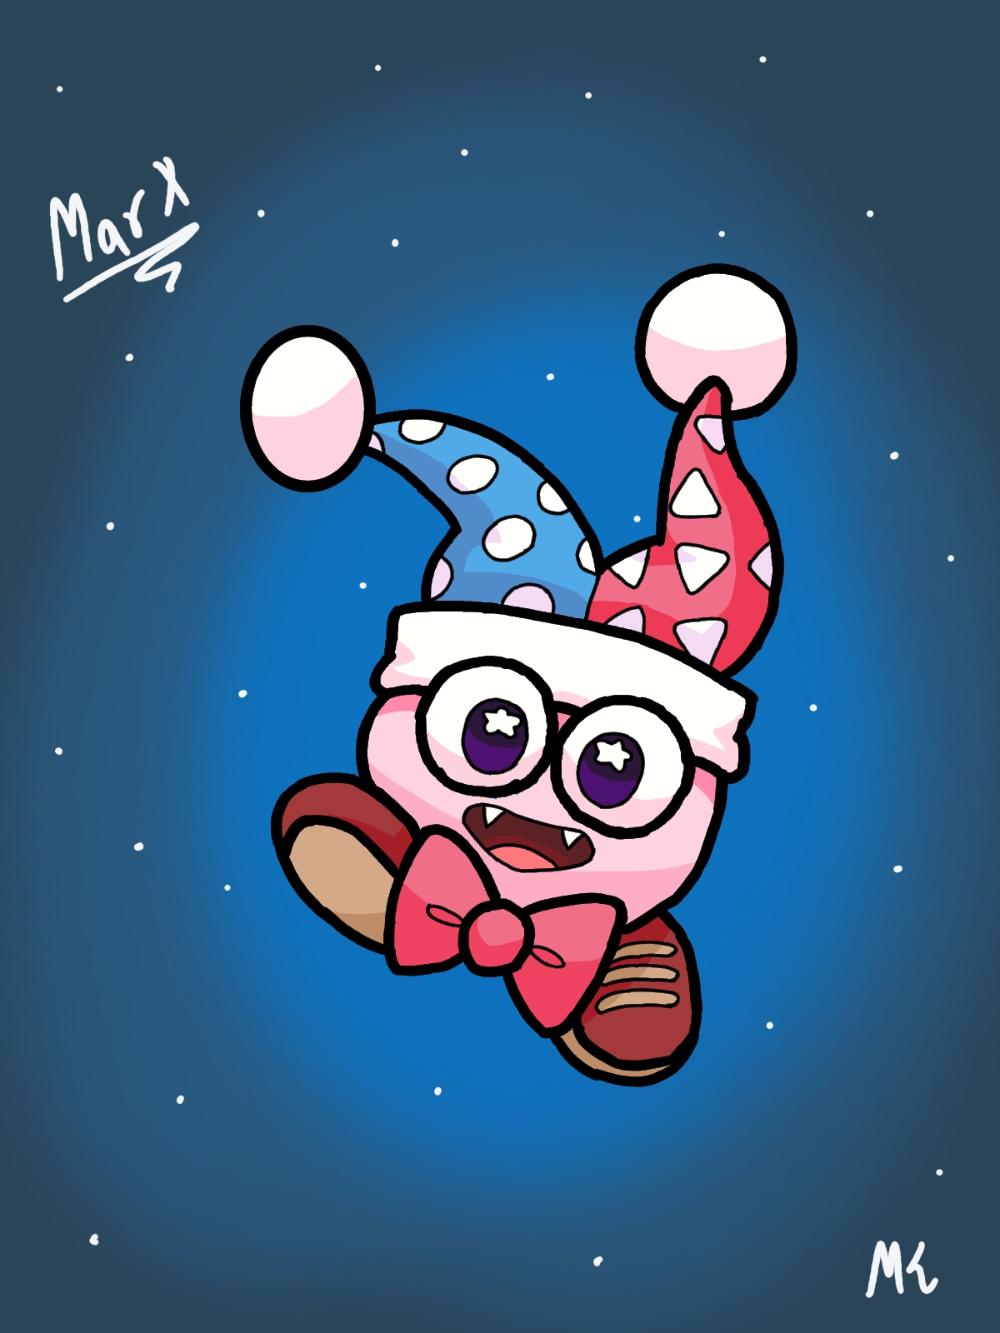 Marx Kirby By Maskedknightyt On Deviantart Kirby Art Kirby Cute Wallpaper For Phone